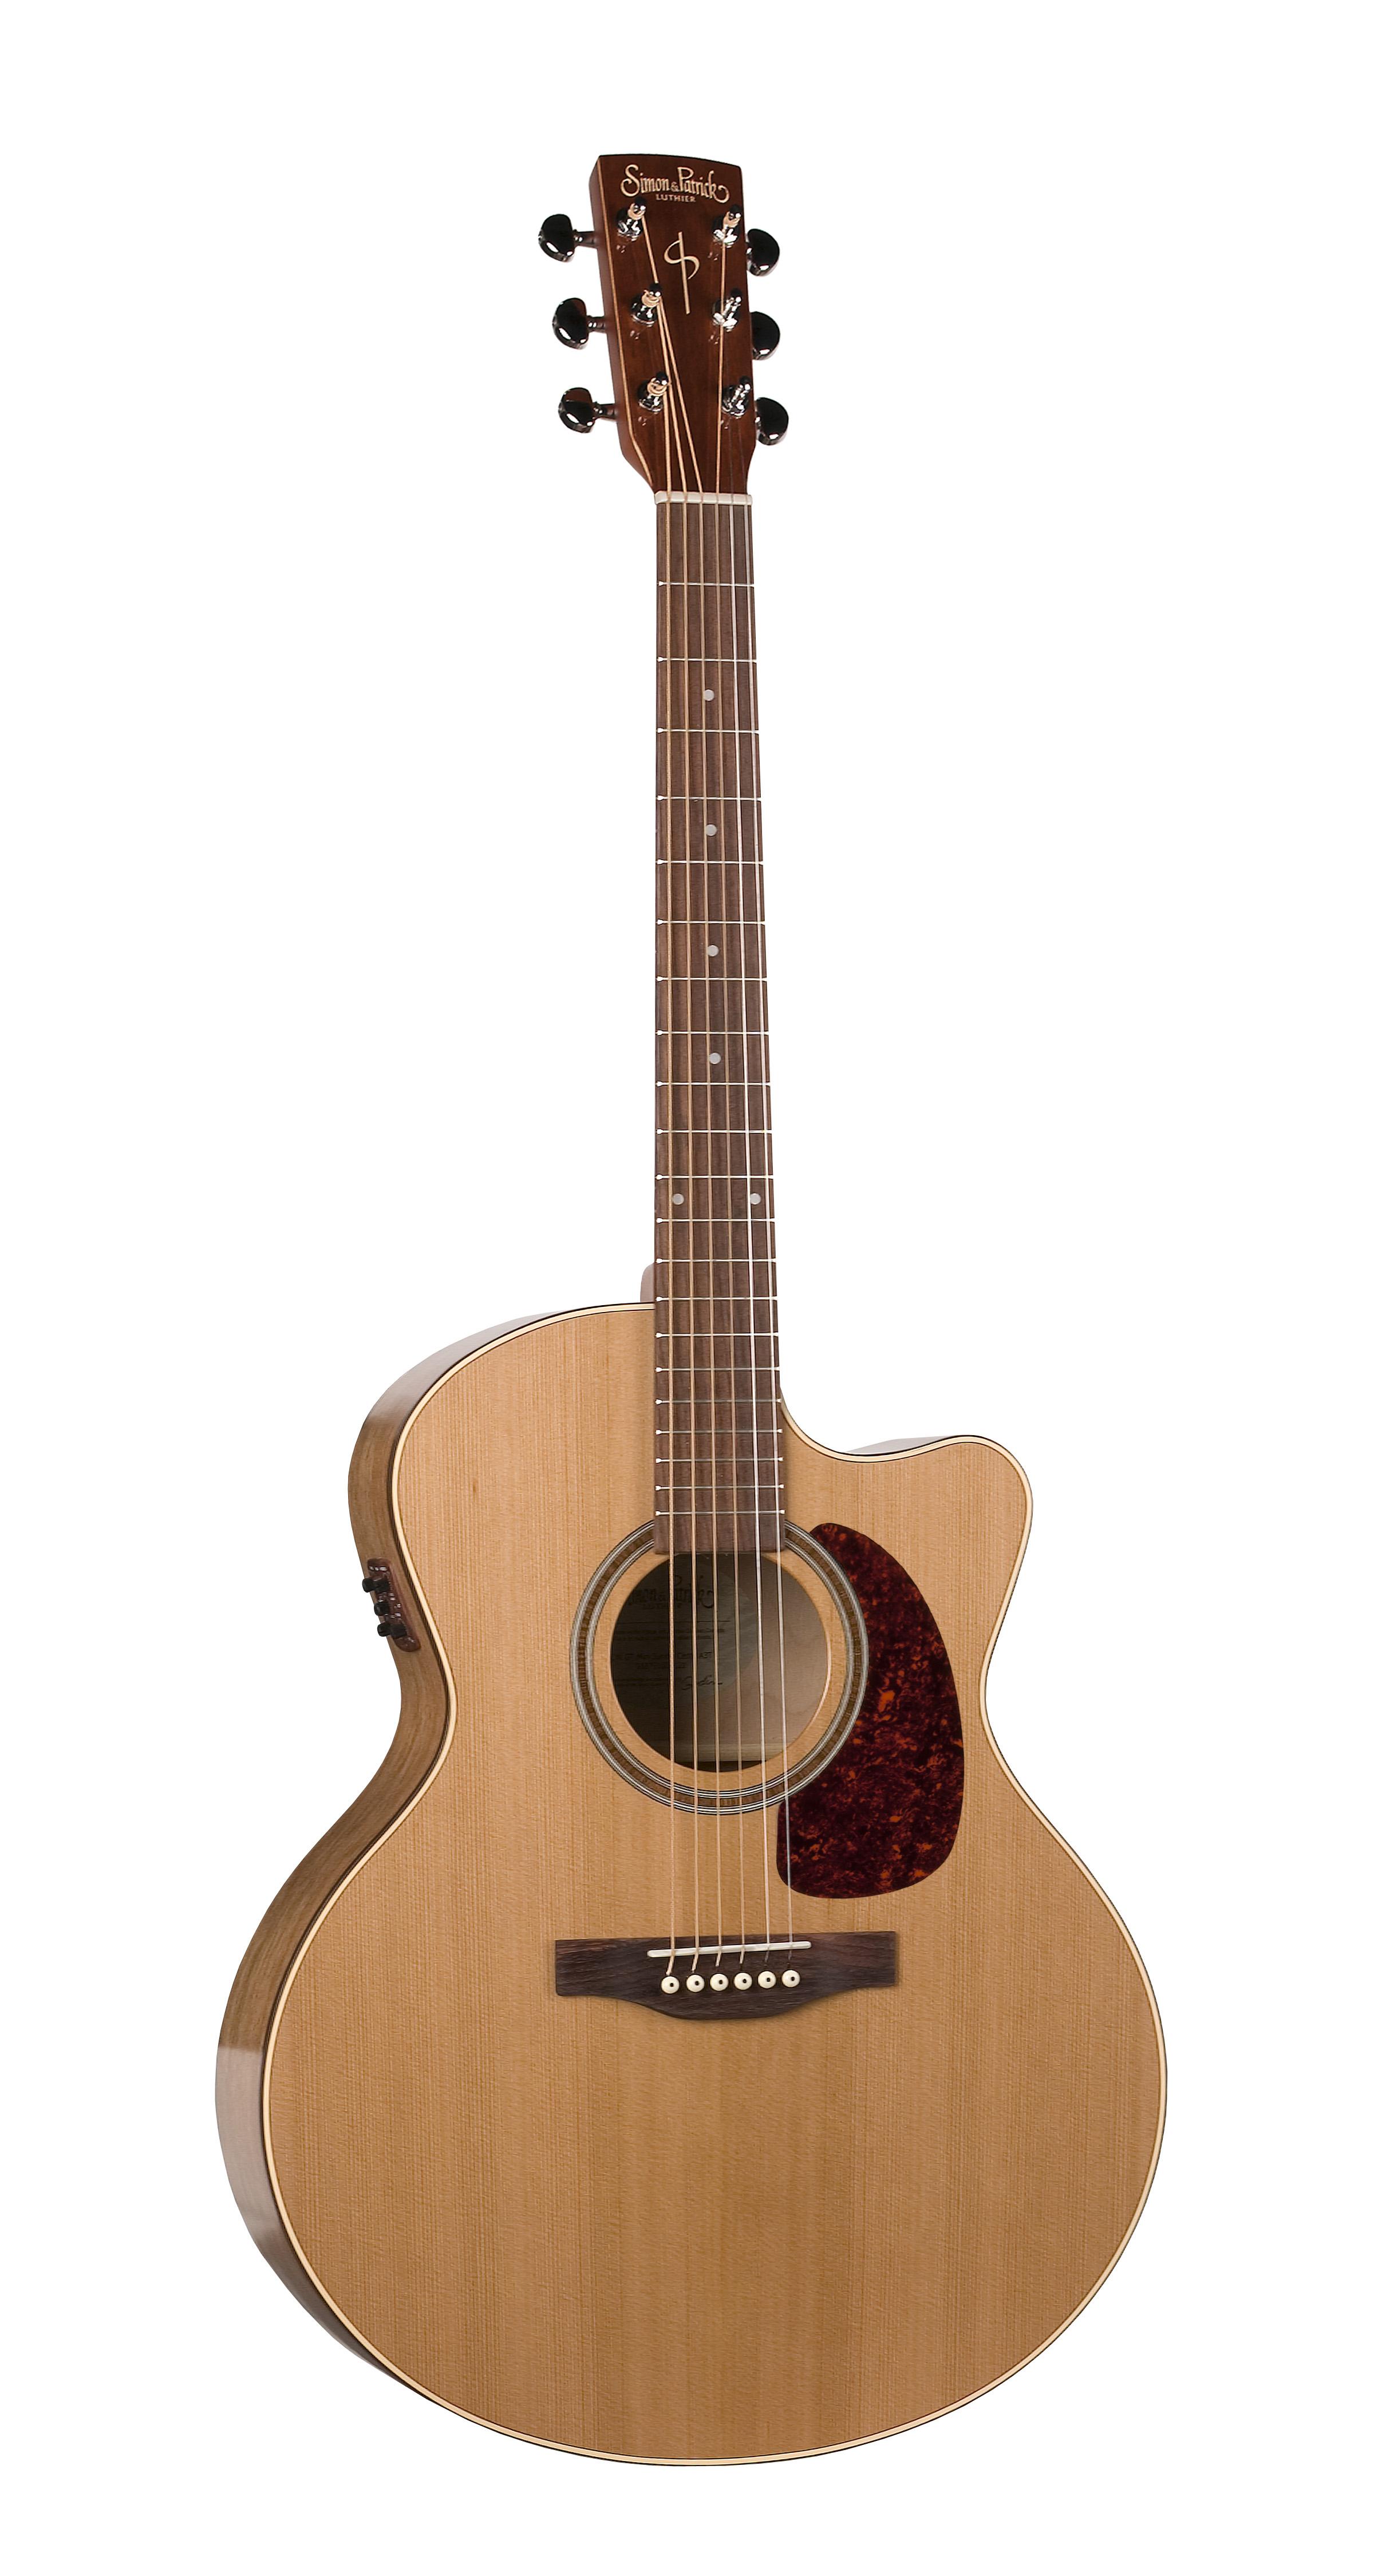 Simon & Patrick 33751 Cedar Gloss Top (GT) Cutaway Mini-Jumbo Acoustic Electric Guitar w/ B-band A3T